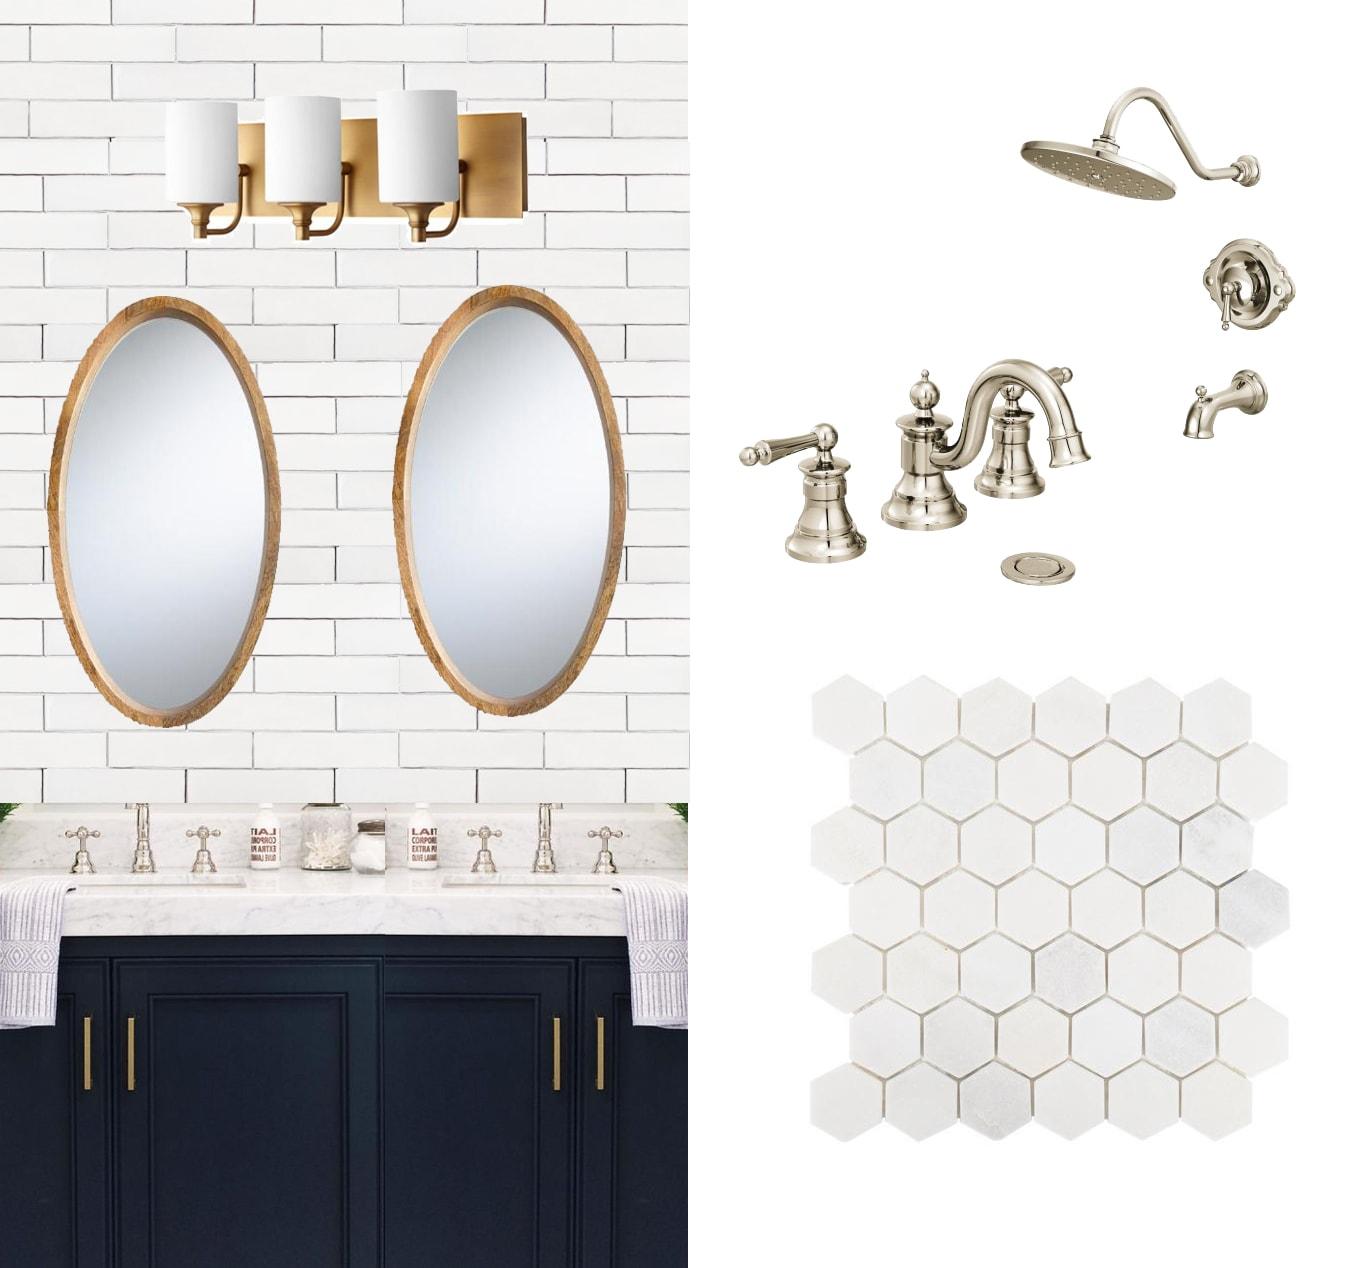 Navy and Marble Bathroom Design Plan - Maison de Pax